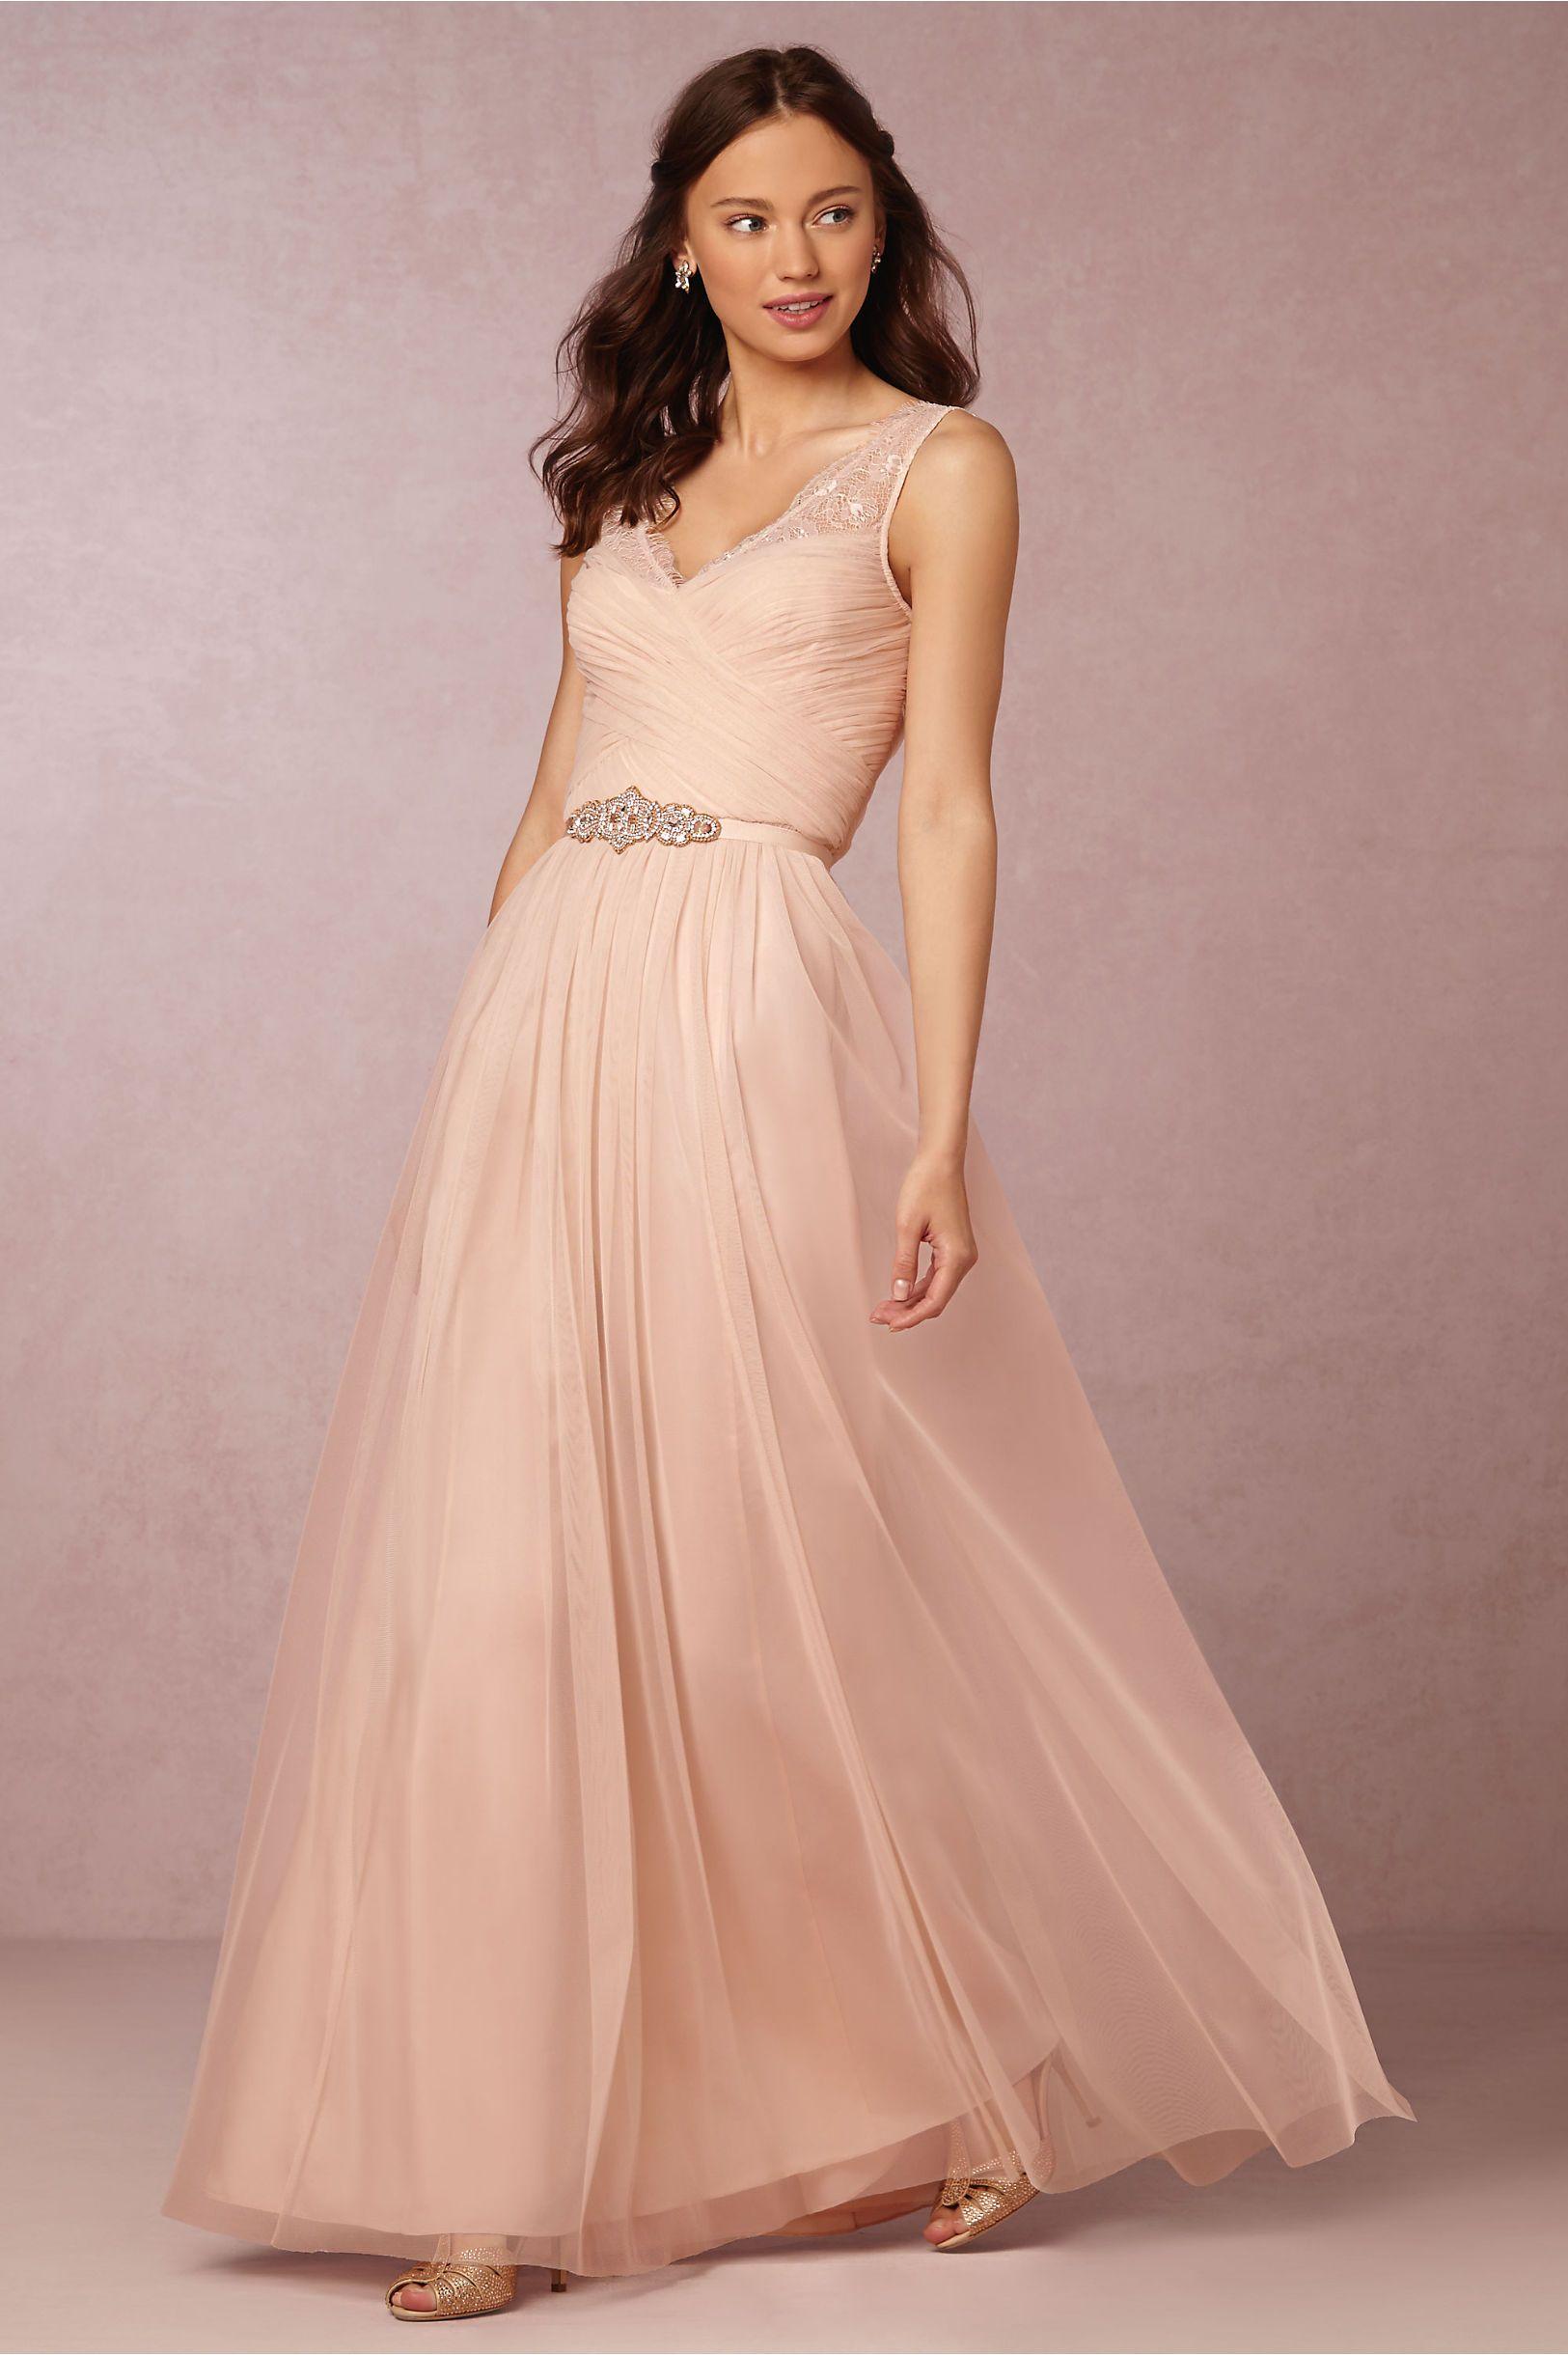 Long wedding reception dresses for the bride  BHLDN Fleur Dress in Bridal Party  BHLDN  BLUSH  Didnut try on